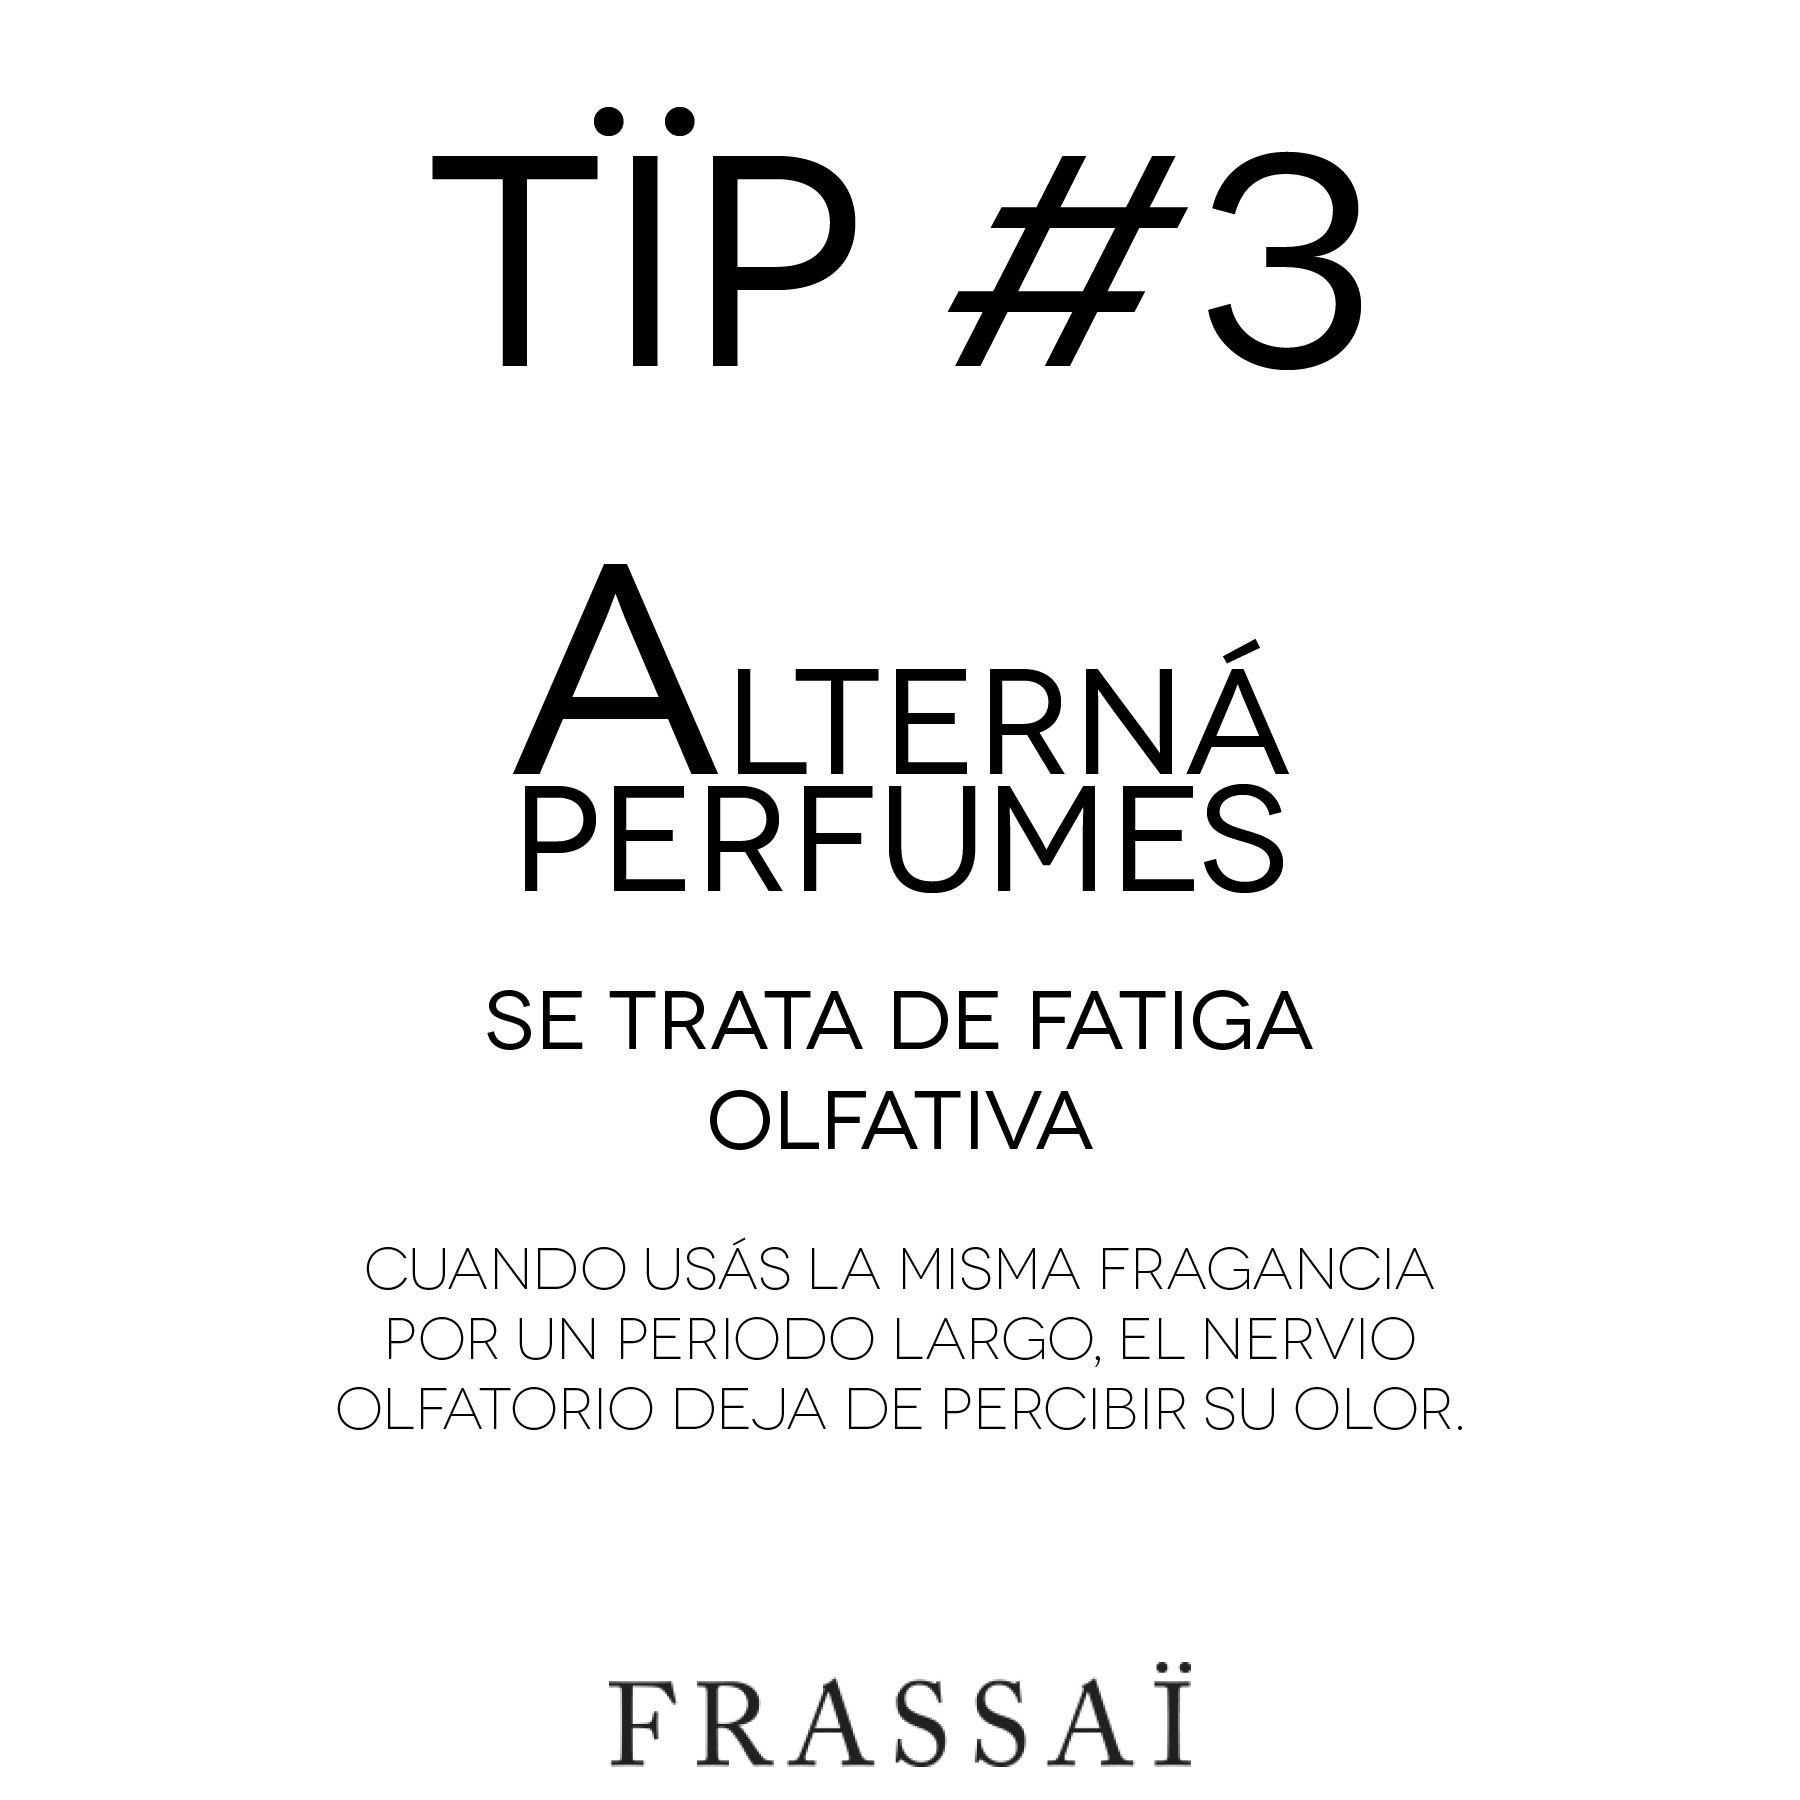 FRASSAI tïps #3 perfumes